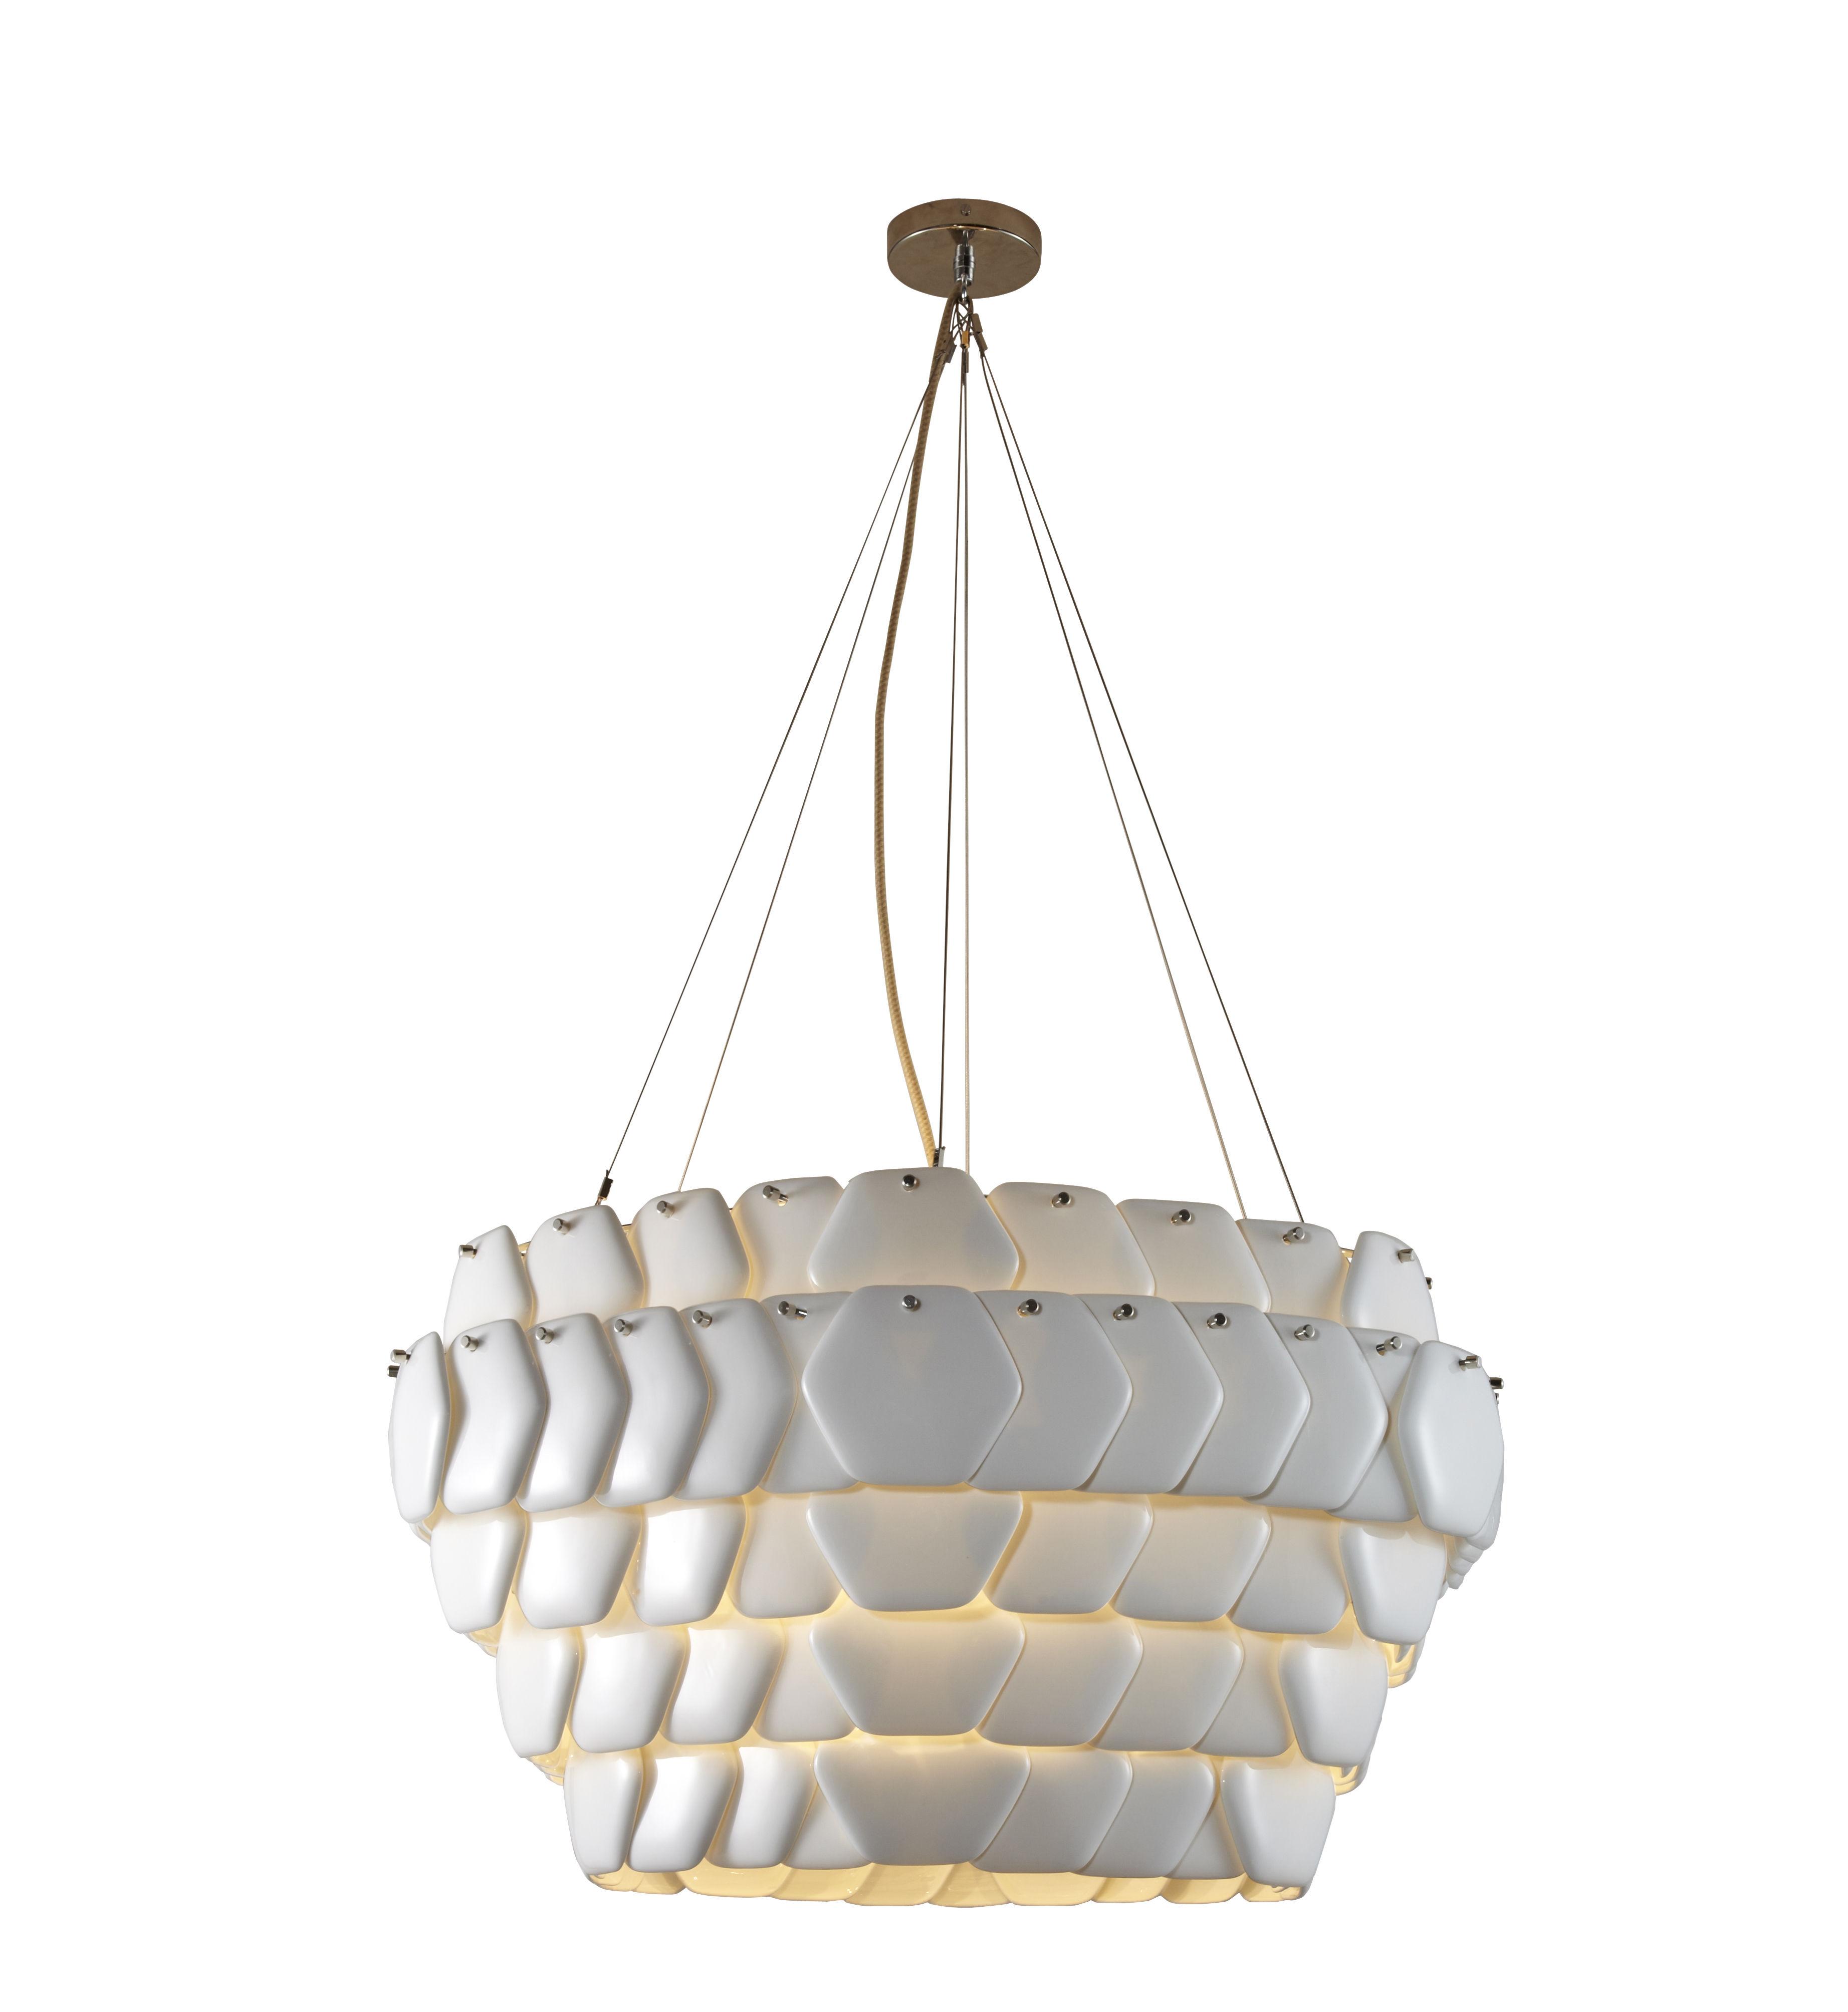 Illuminazione - Lampadari - Sospensione Cranton Hexagonal - / 76 x 72 cm - Porcellana di Original BTC - Esagono L 76 cm / Bianco - Porcellana